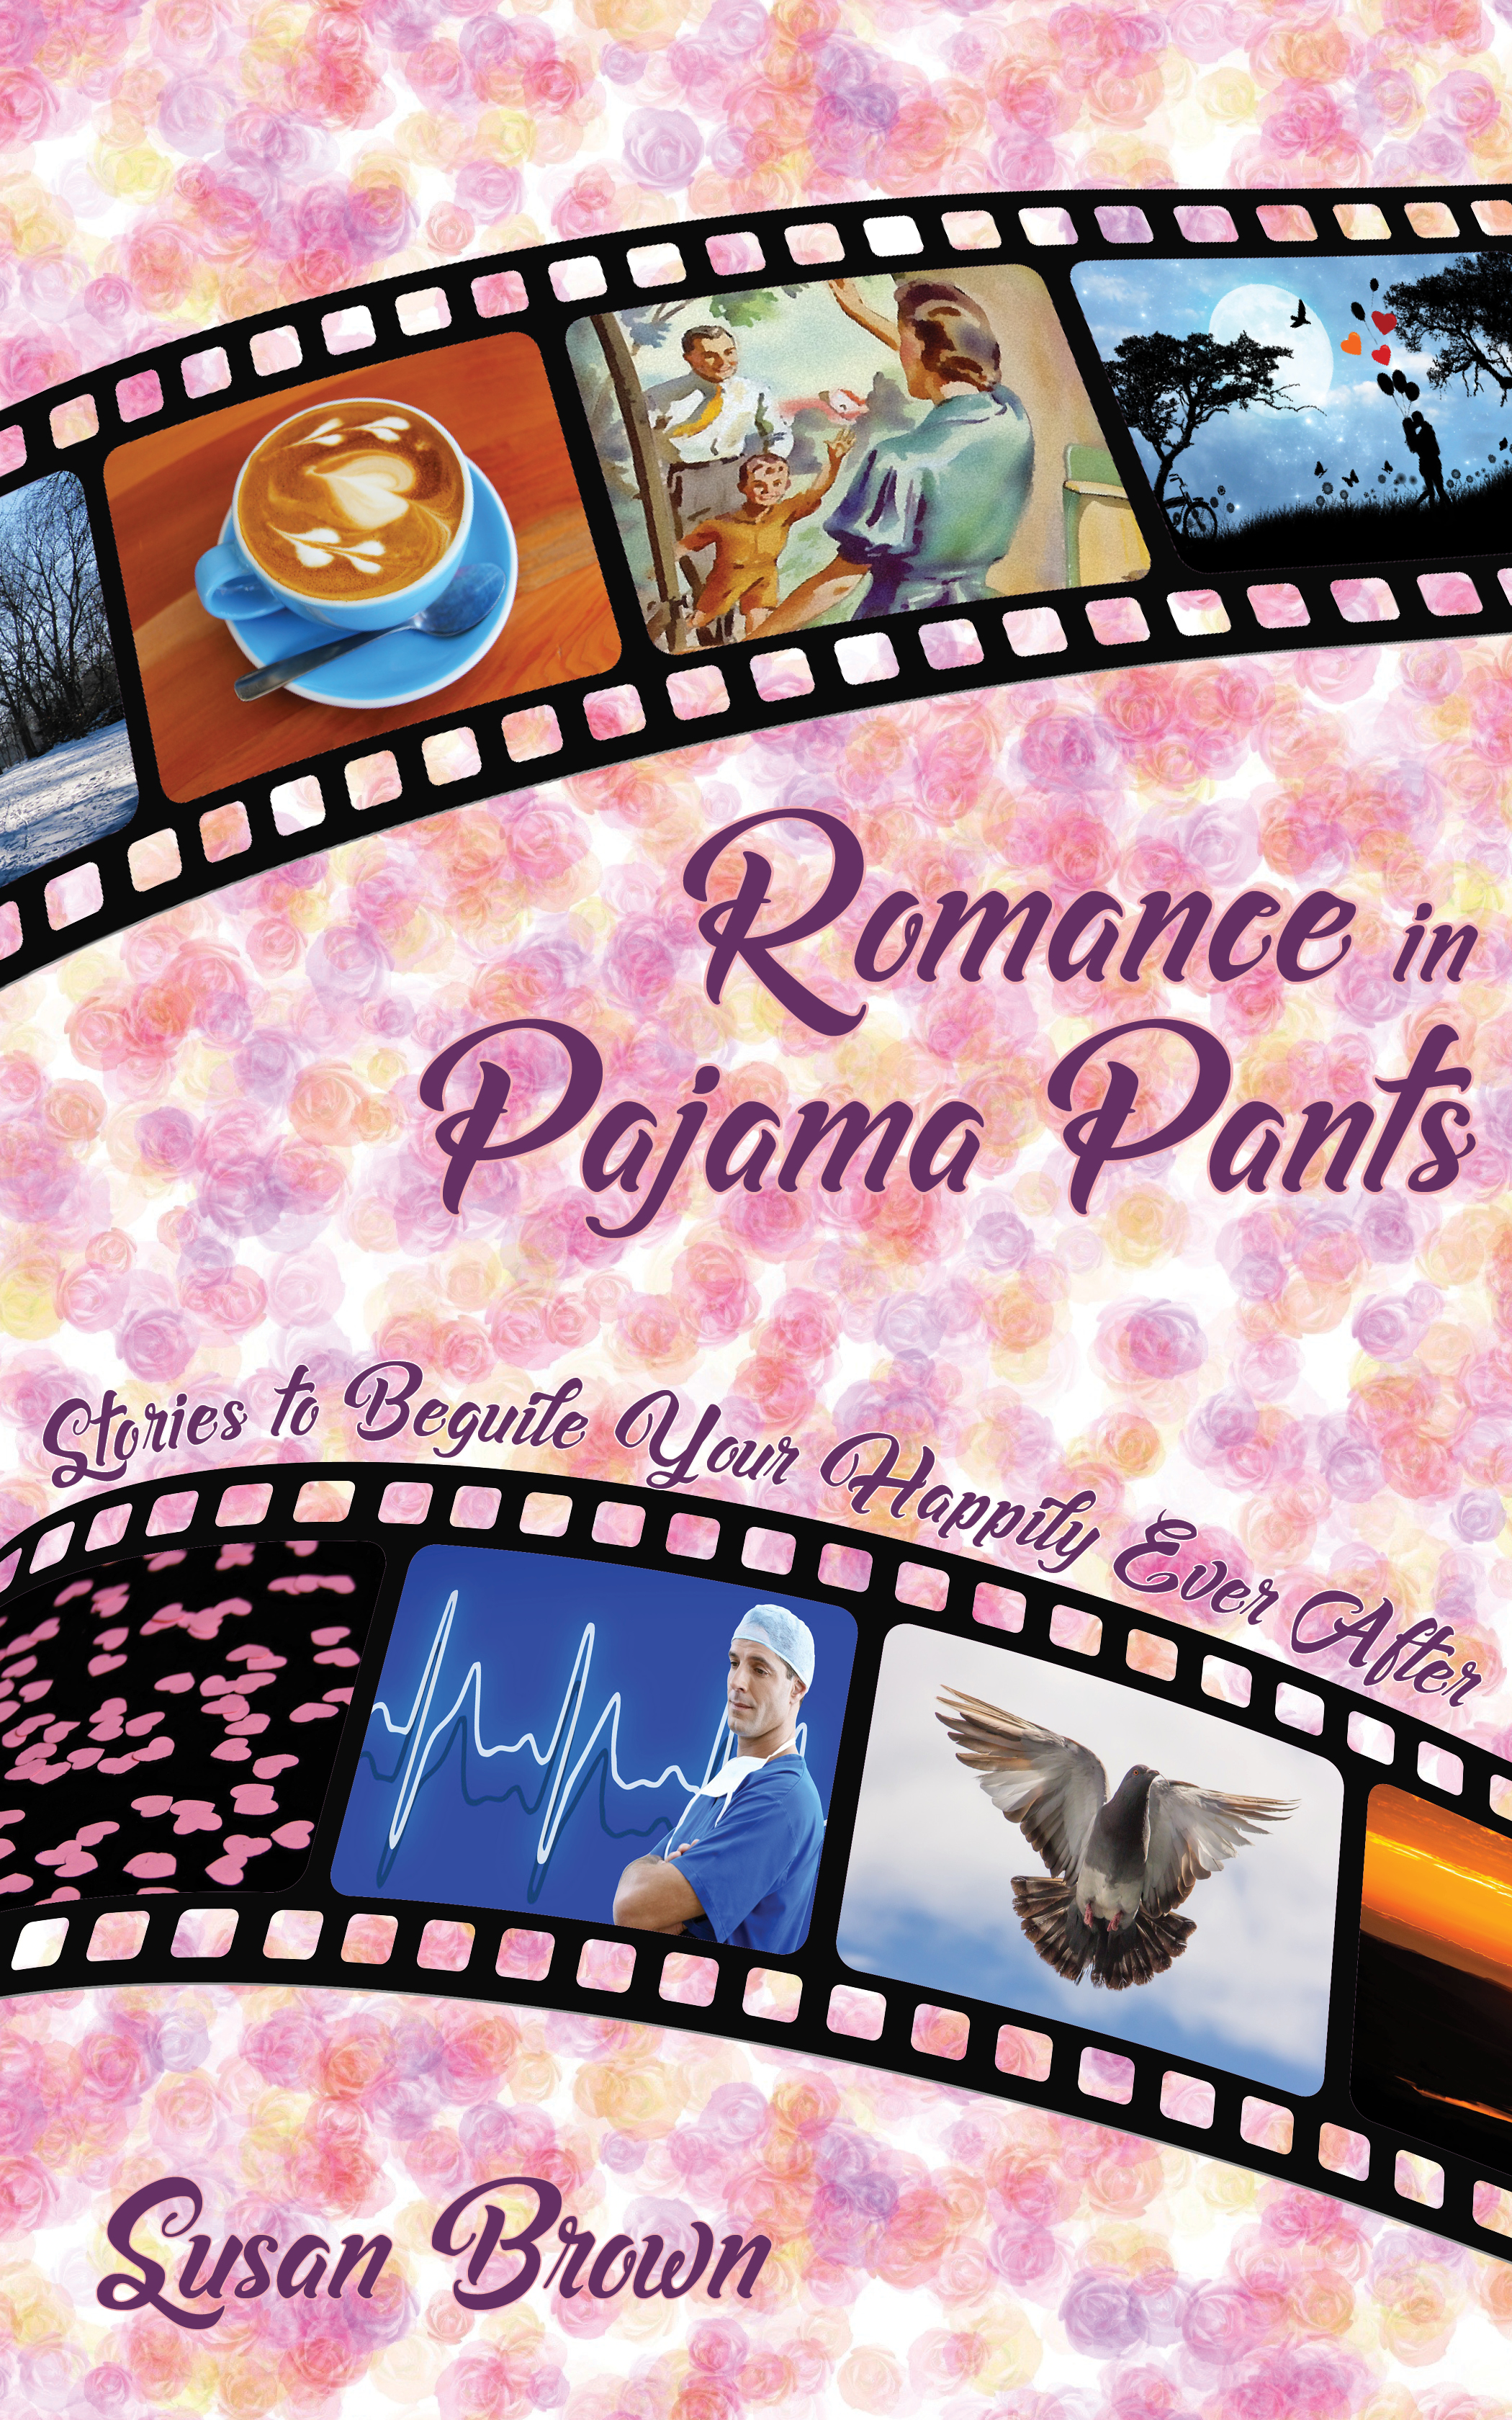 Romance in Pajama Pants.jpg